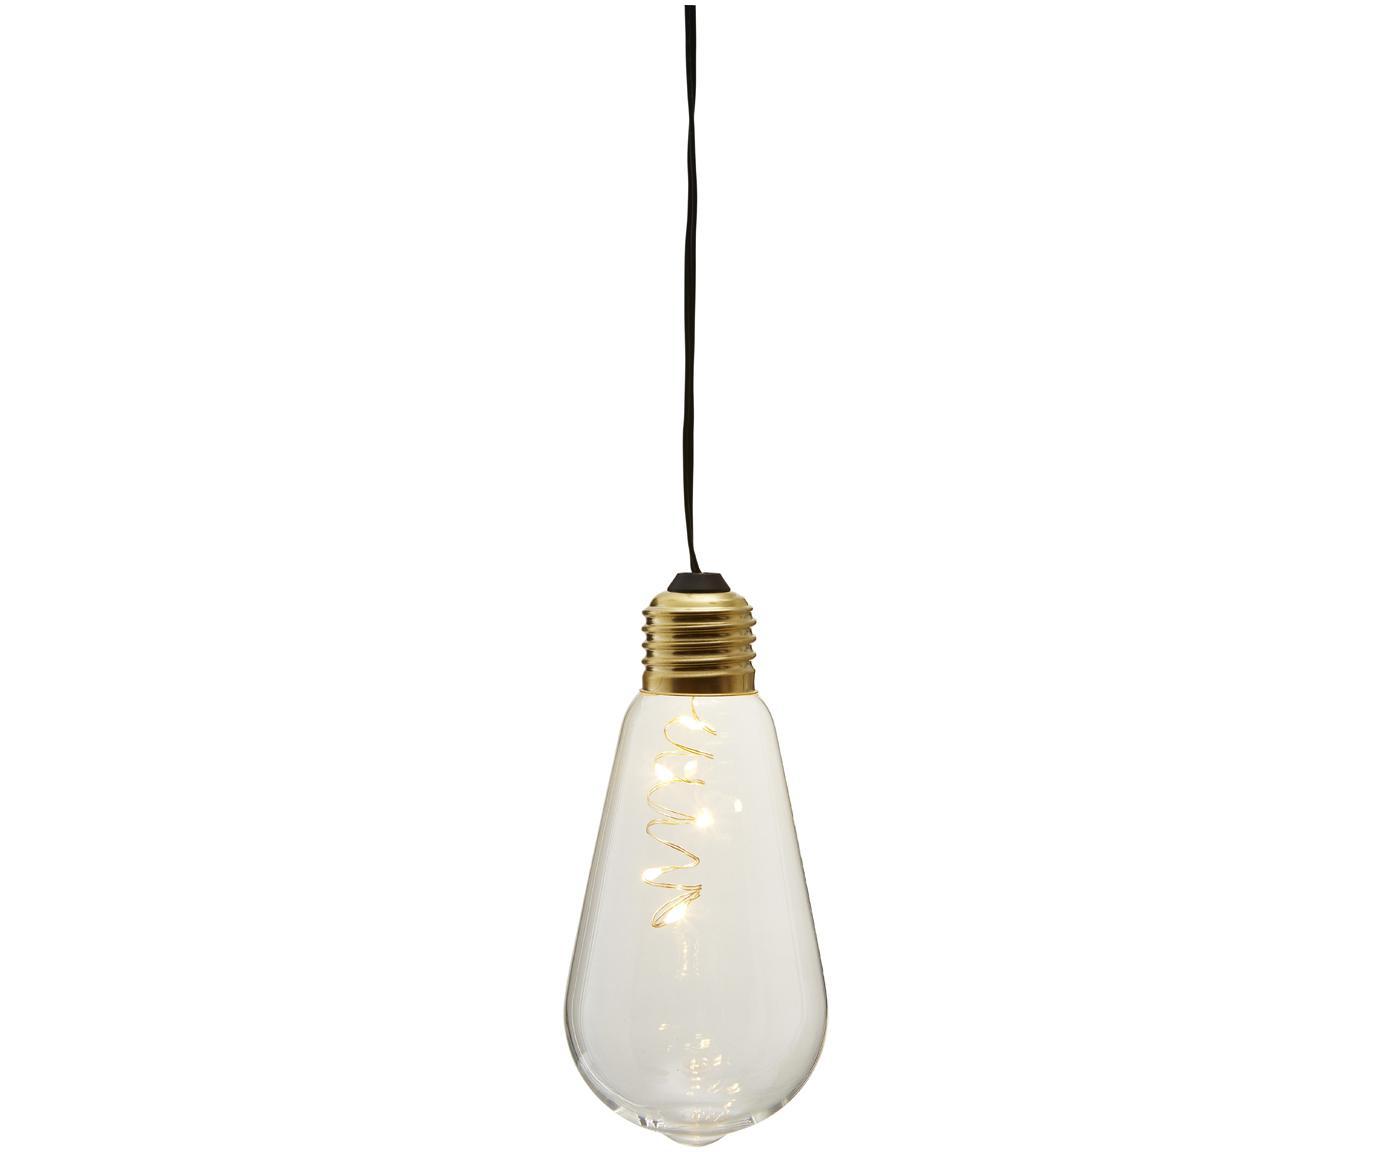 Decoratieve lamp Glow, Lampenkap: glas, Fitting: gecoat metaal, Transparant, Ø 6 x H 13 cm